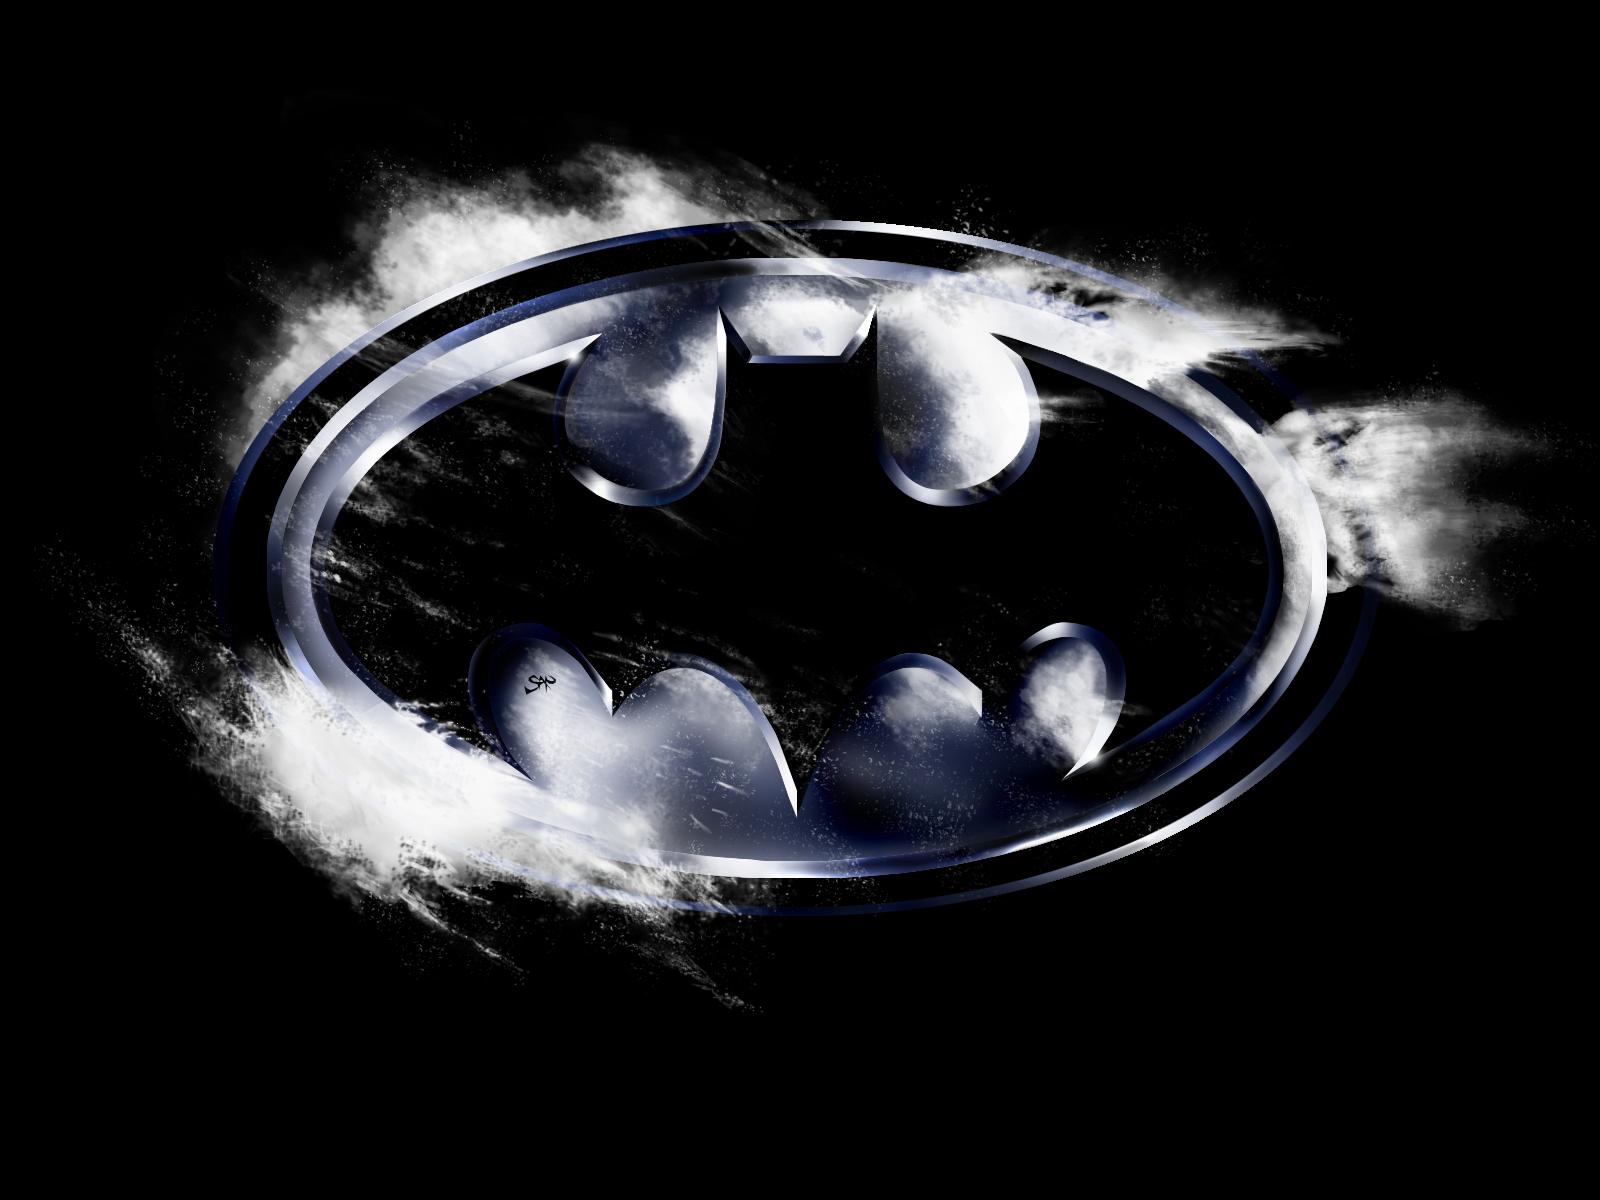 Dark Batman Logo HD Wallpaper Vector Designs Wallpapers 1600x1200